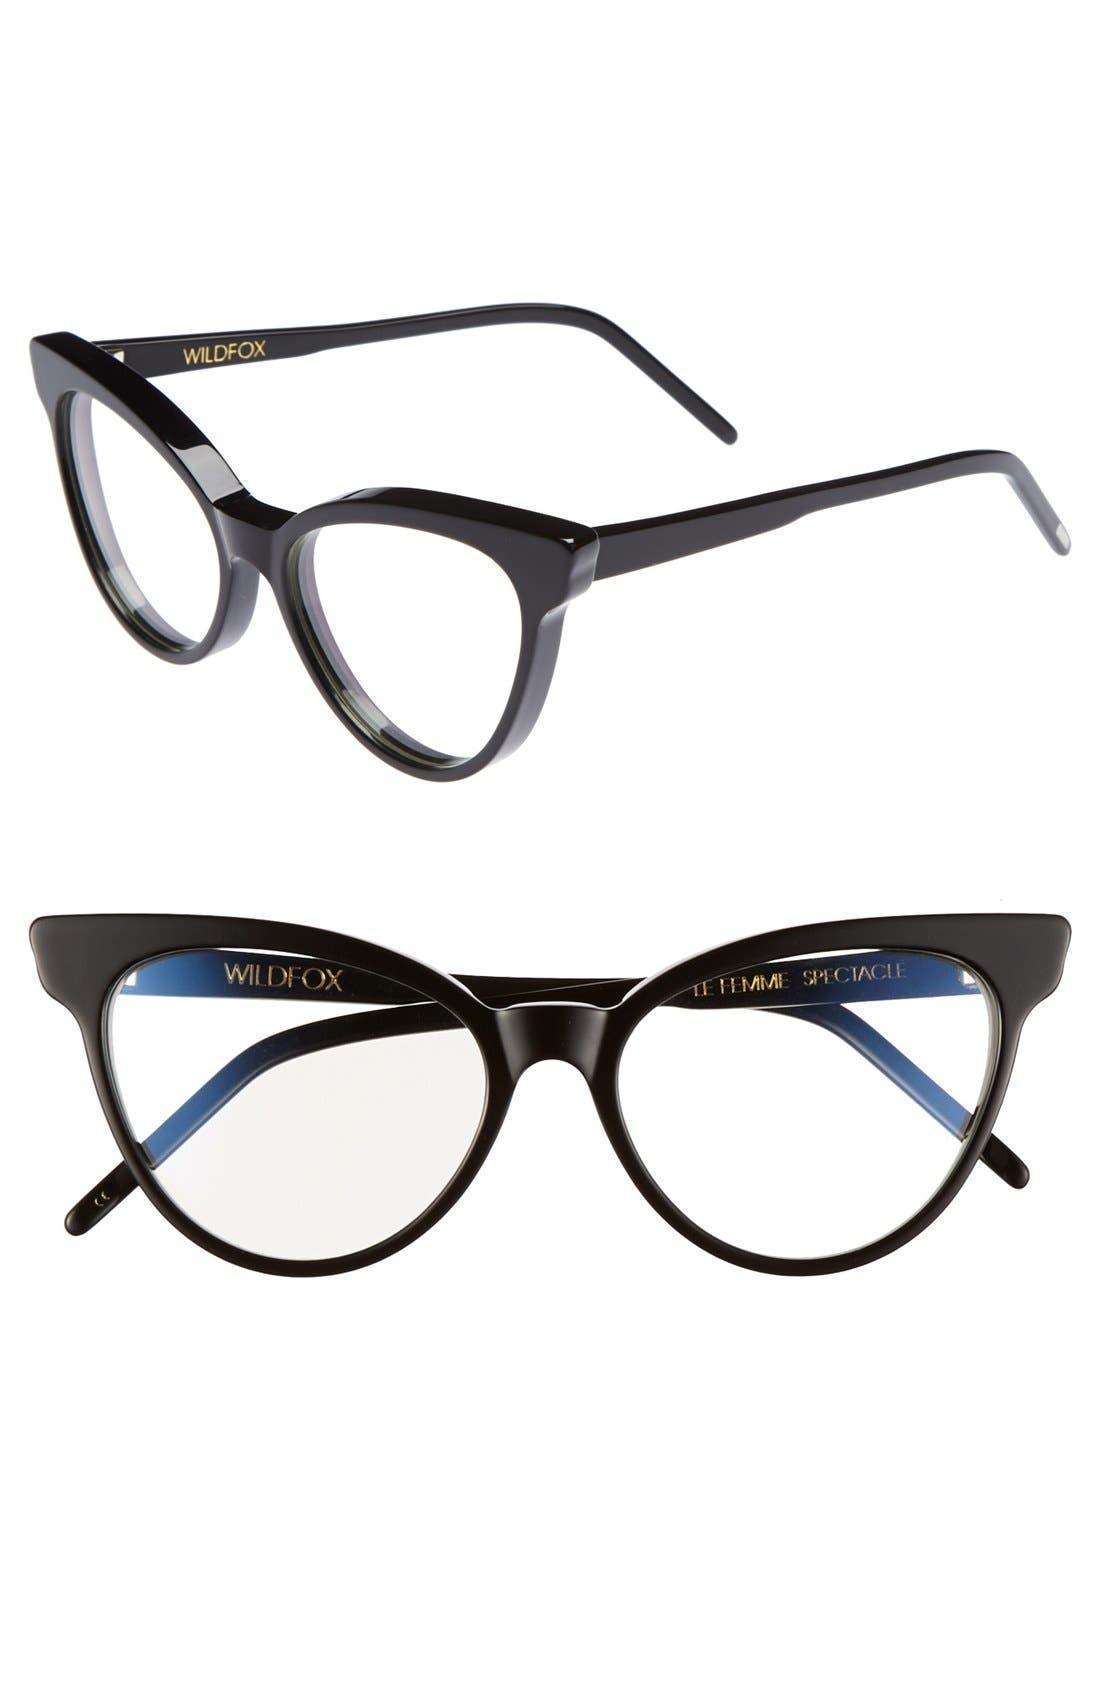 Main Image - Wildfox 'La Femme' 54mm Optical Glasses